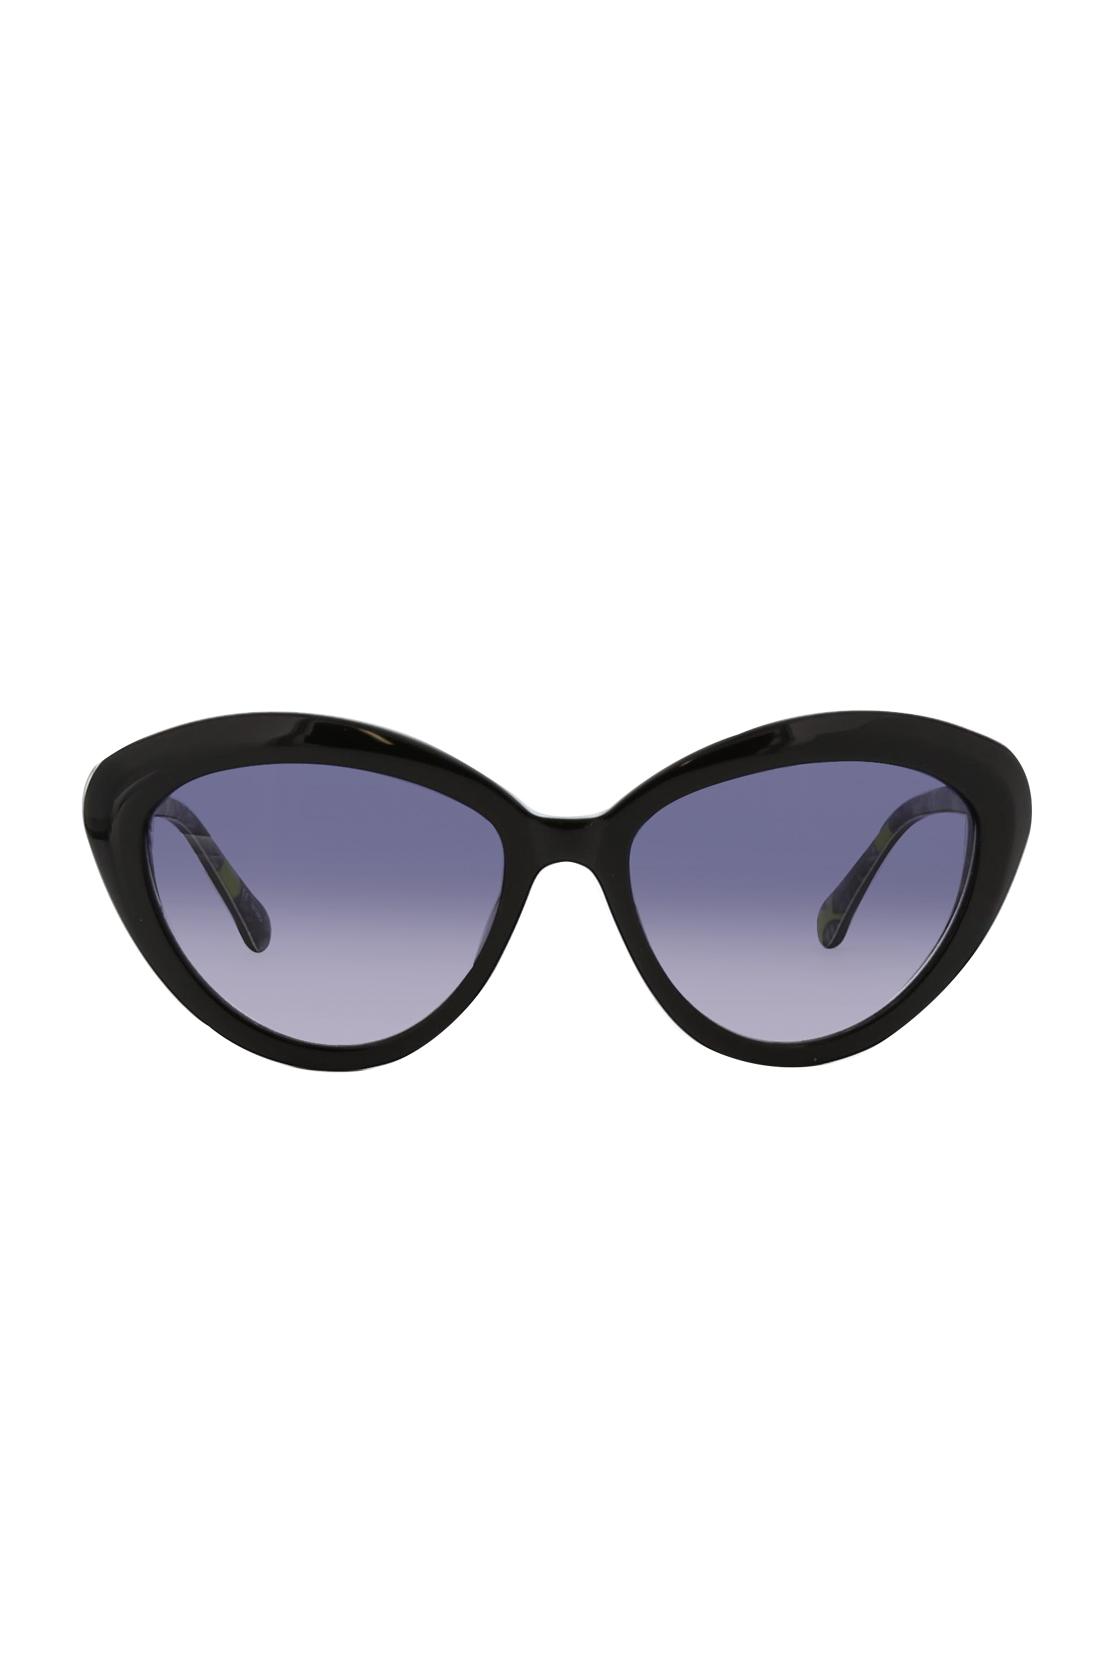 1120x1660 Sun Glasses Png Importance Of Sunglasses Eyetique Eye Doctor Eye